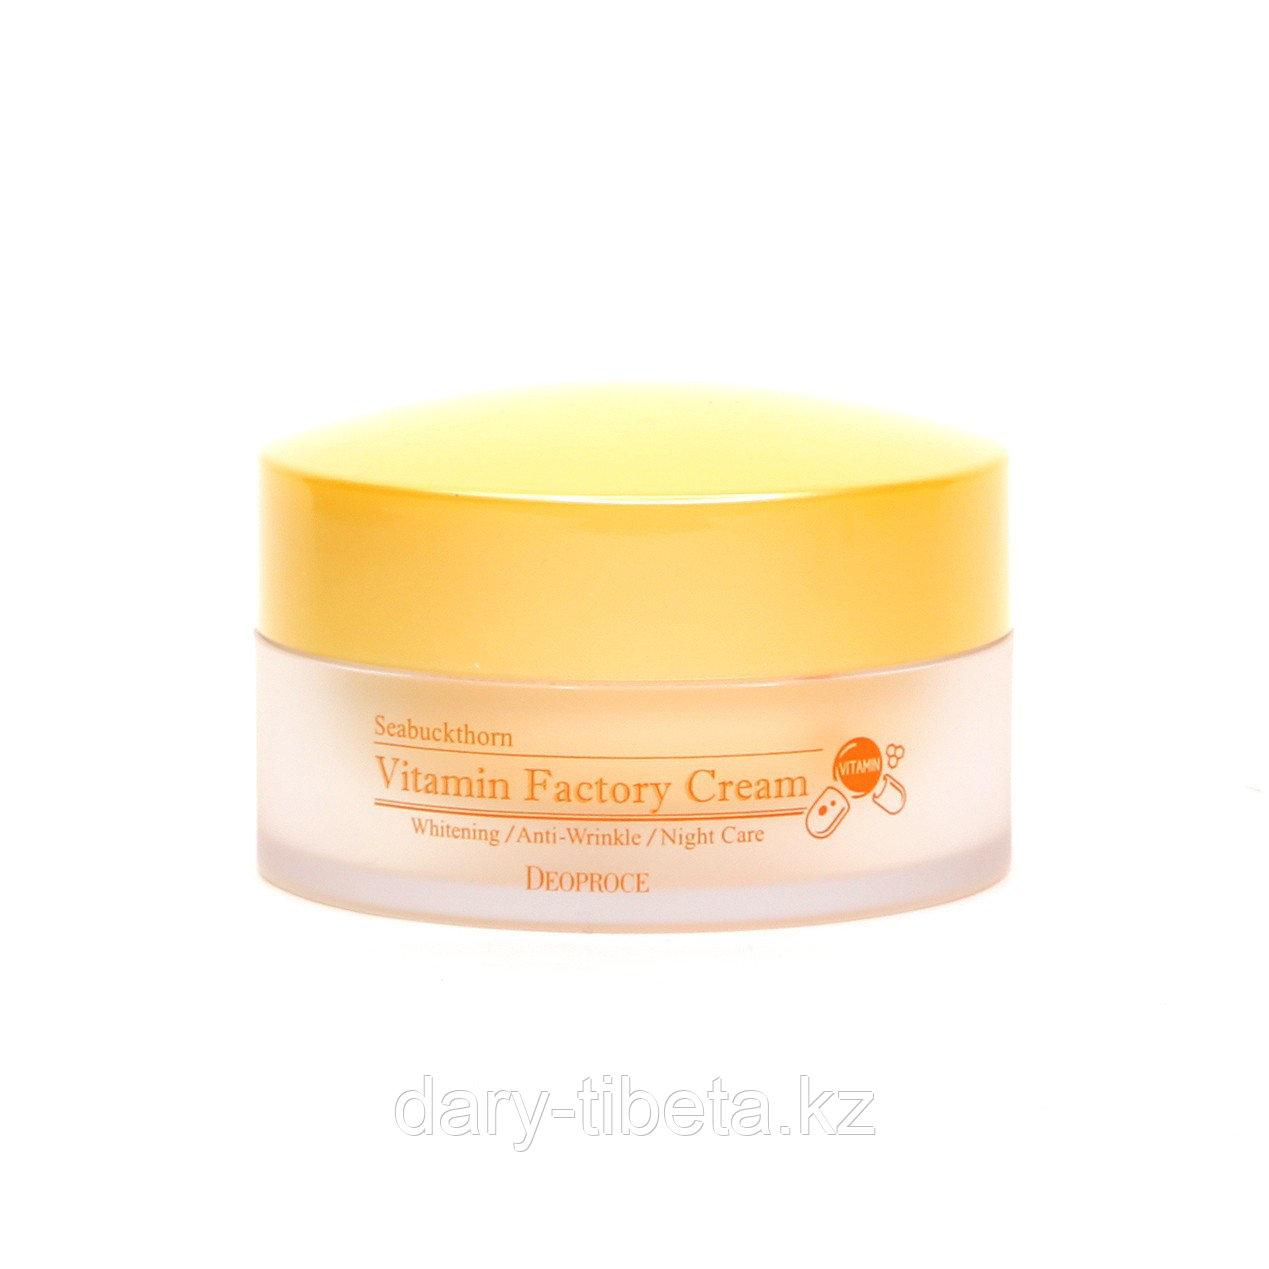 Deoproce Seabuckthorn Vitamin Factory Cream- Омолаживающий витаминный крем с облепихой